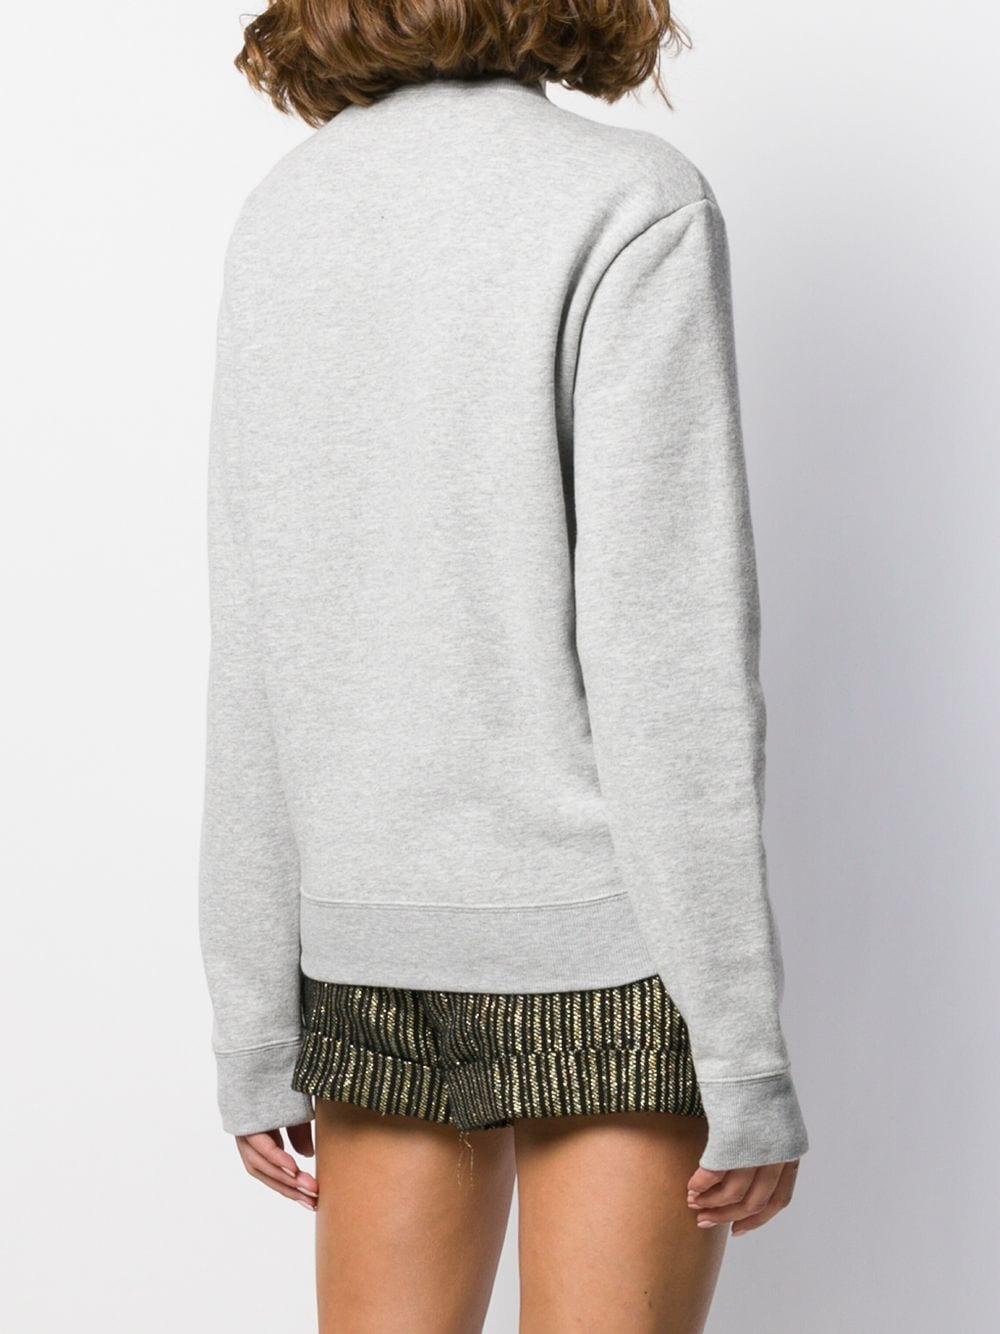 Picture of Saint Laurent   Malibu Crewneck Sweatshirt